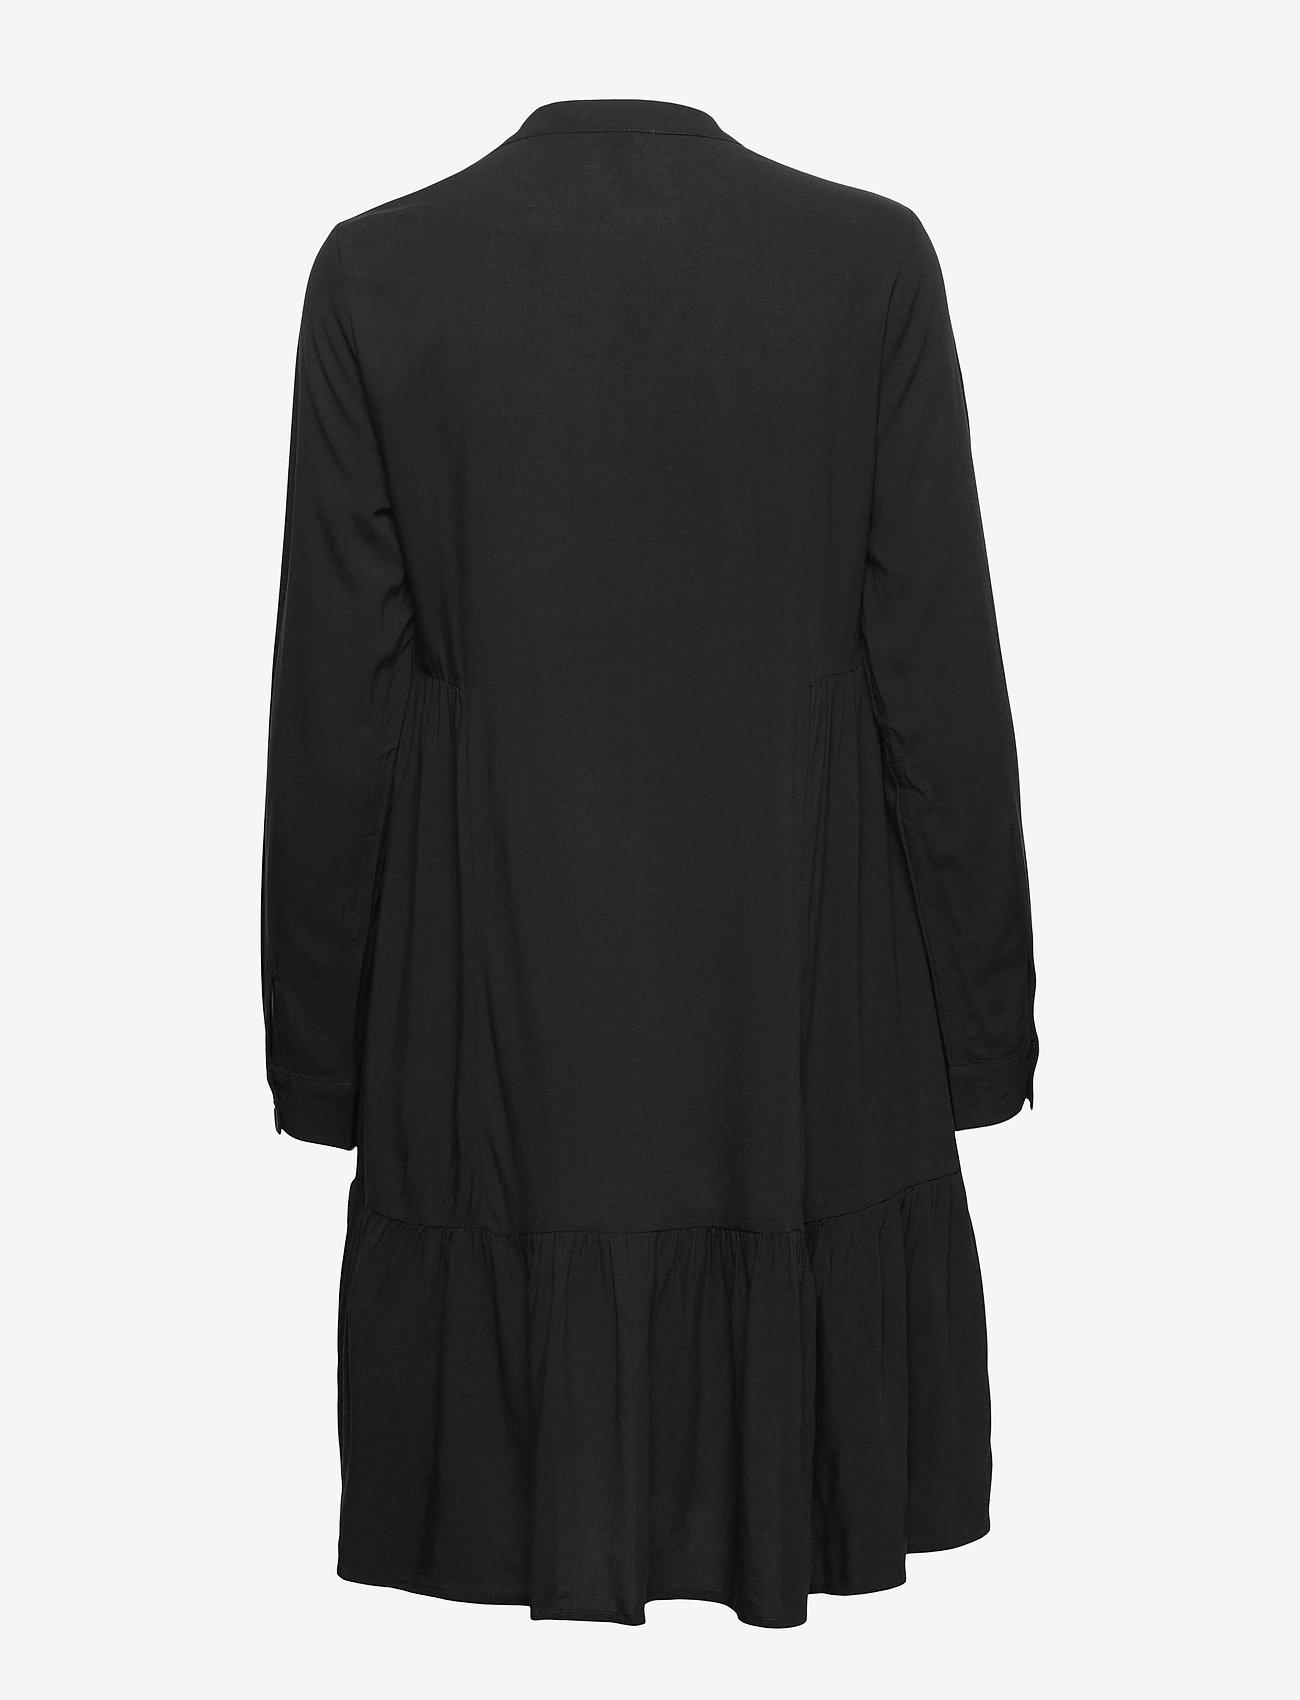 Soyaconcept - SC-RADIA - everyday dresses - black - 1